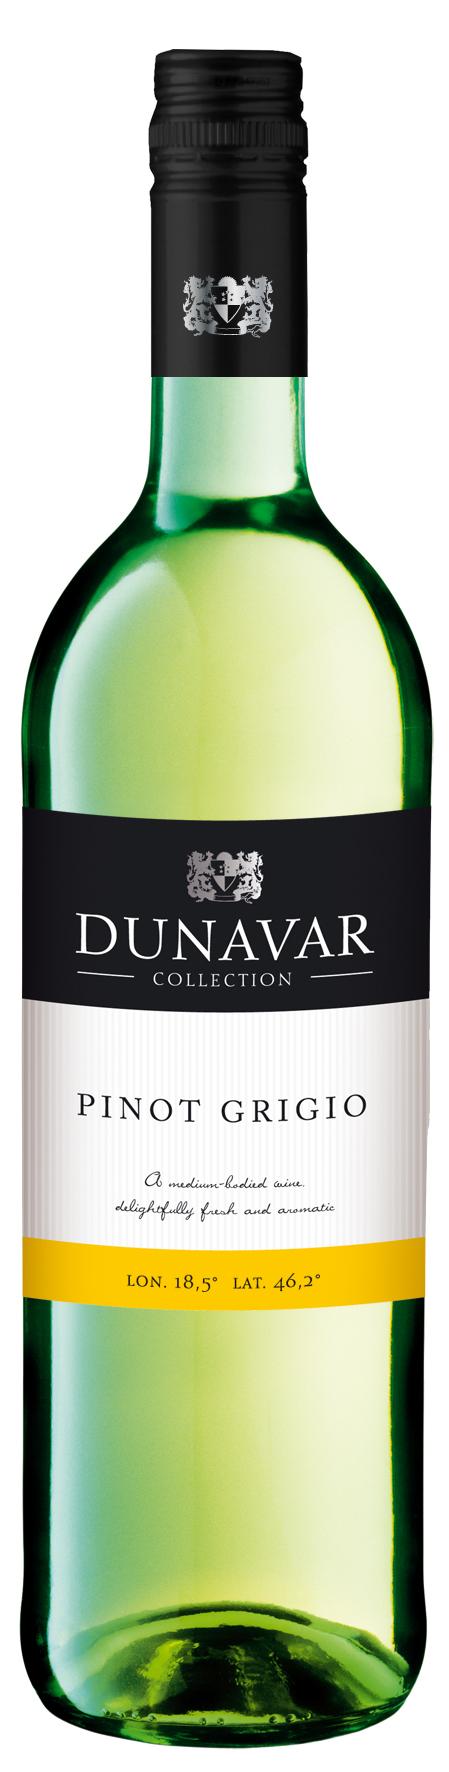 RDunavar Pinot Grigio 2015, Felső-Magyarország, Hungary